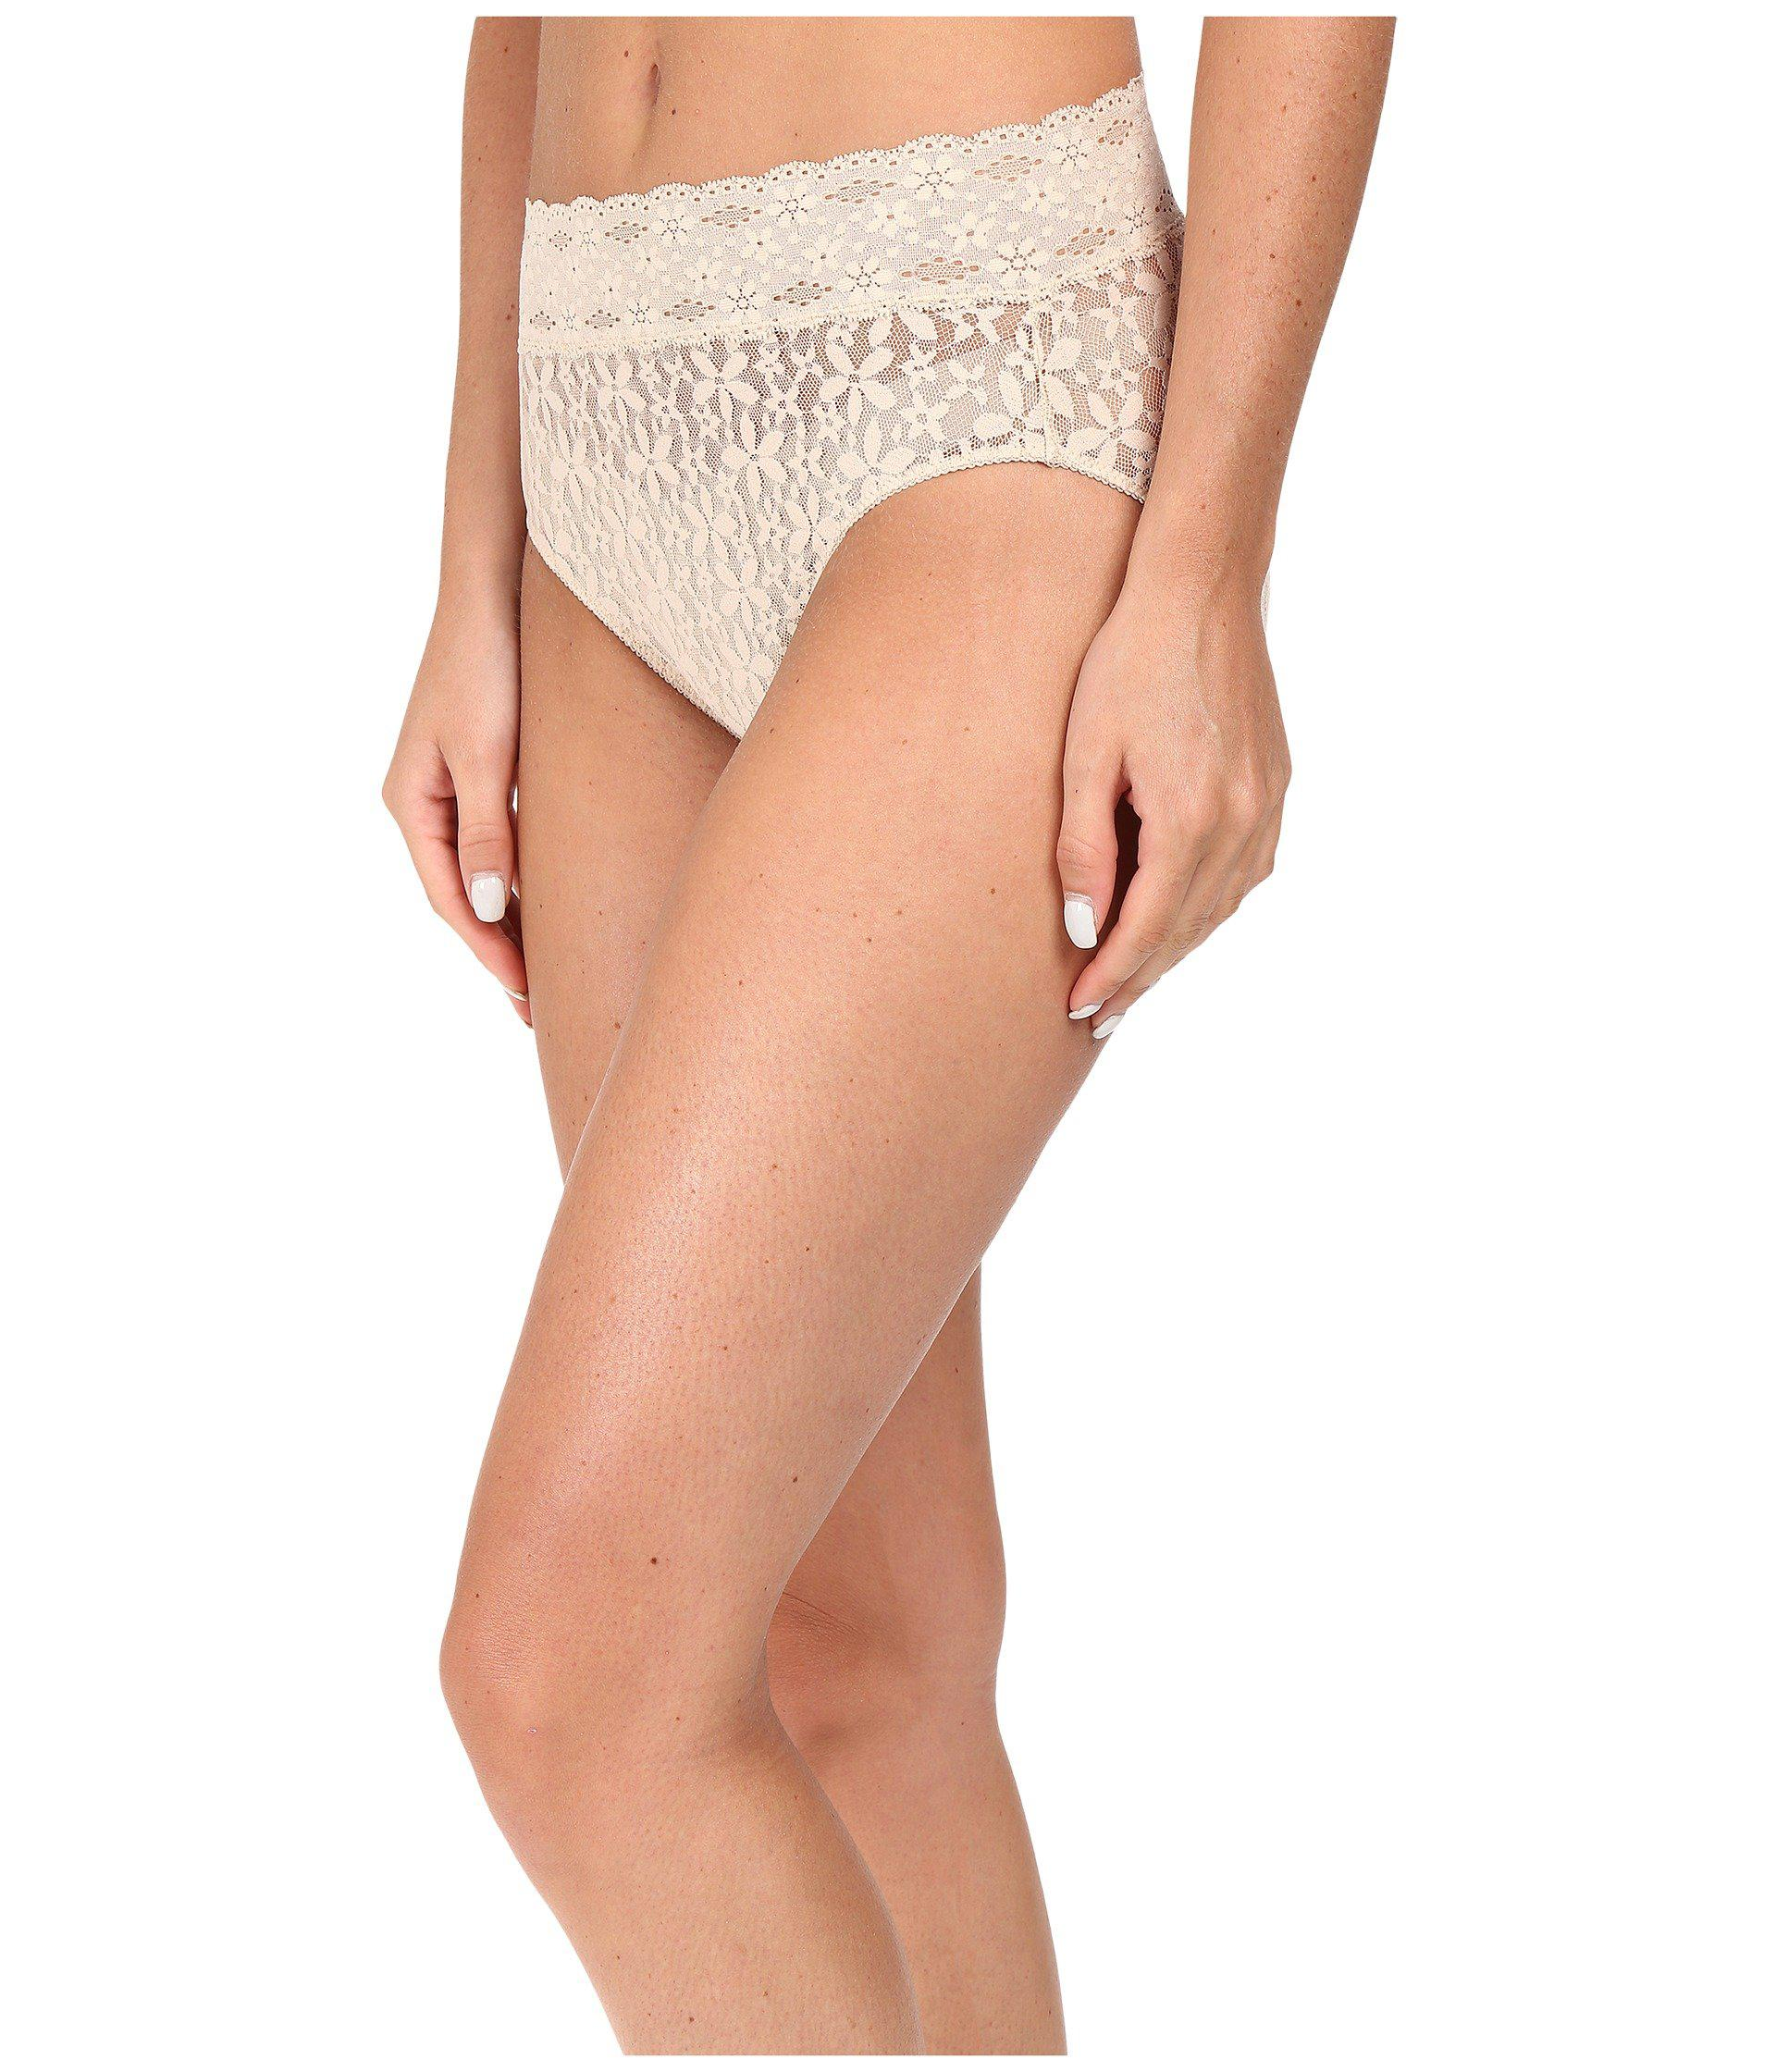 853b5bca1a Lyst - Wacoal Halo Lace Hi-cut Brief (ivory) Women s Underwear